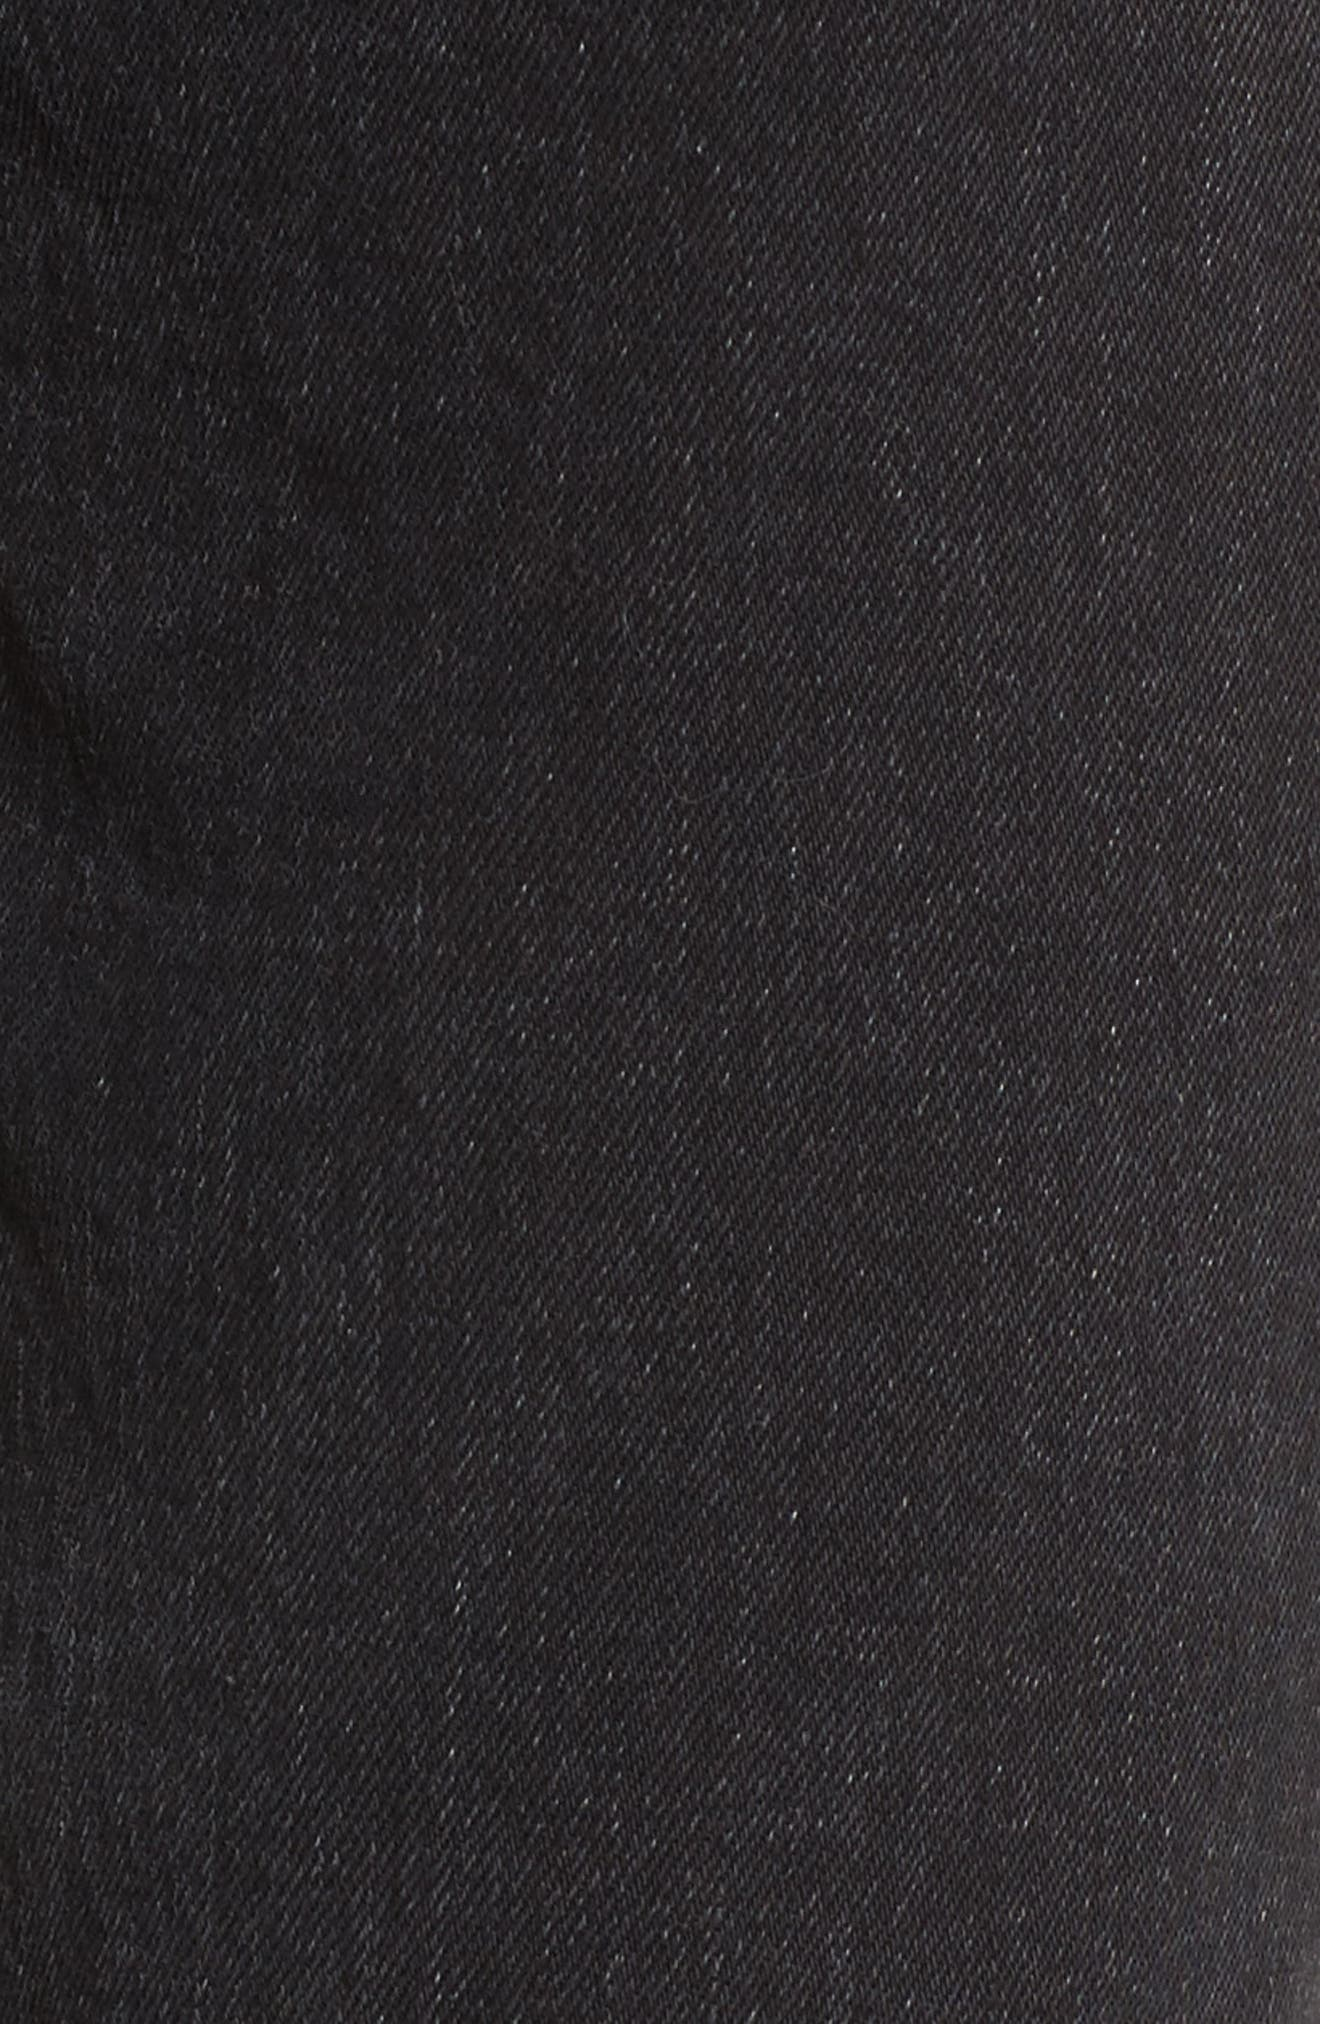 Bond Loose Fit Ankle Skinny Jeans,                             Alternate thumbnail 5, color,